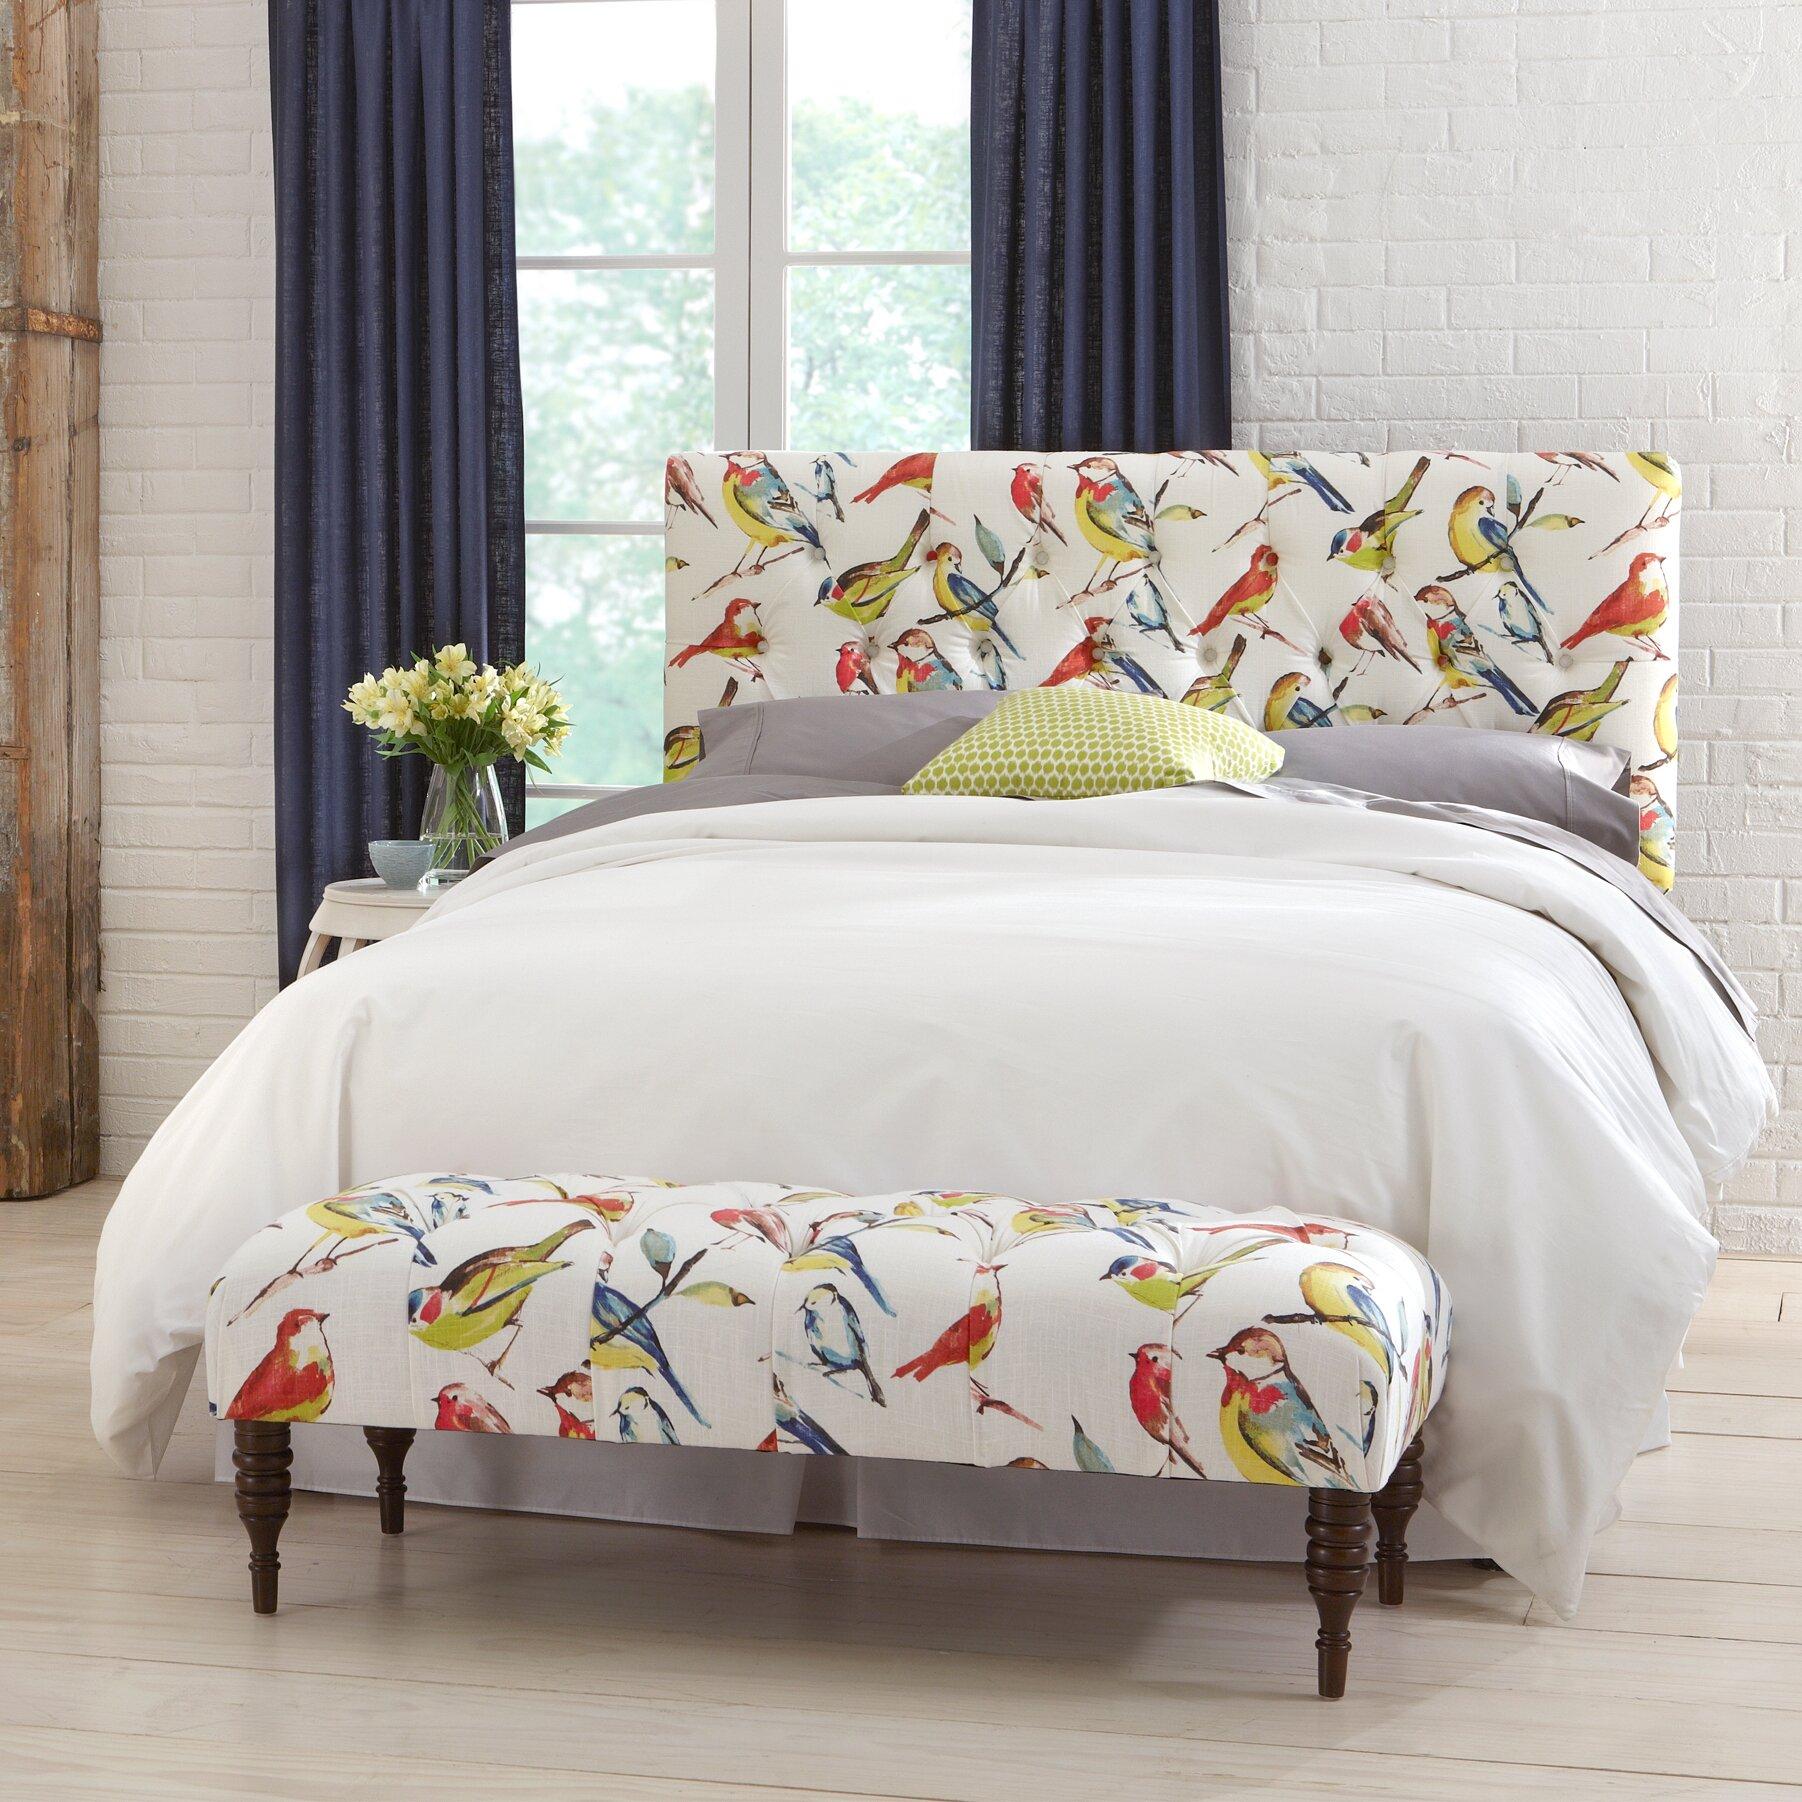 PRI Upholstered Tufted Bedroom Bench Reviews Wayfair. Bedroom ...